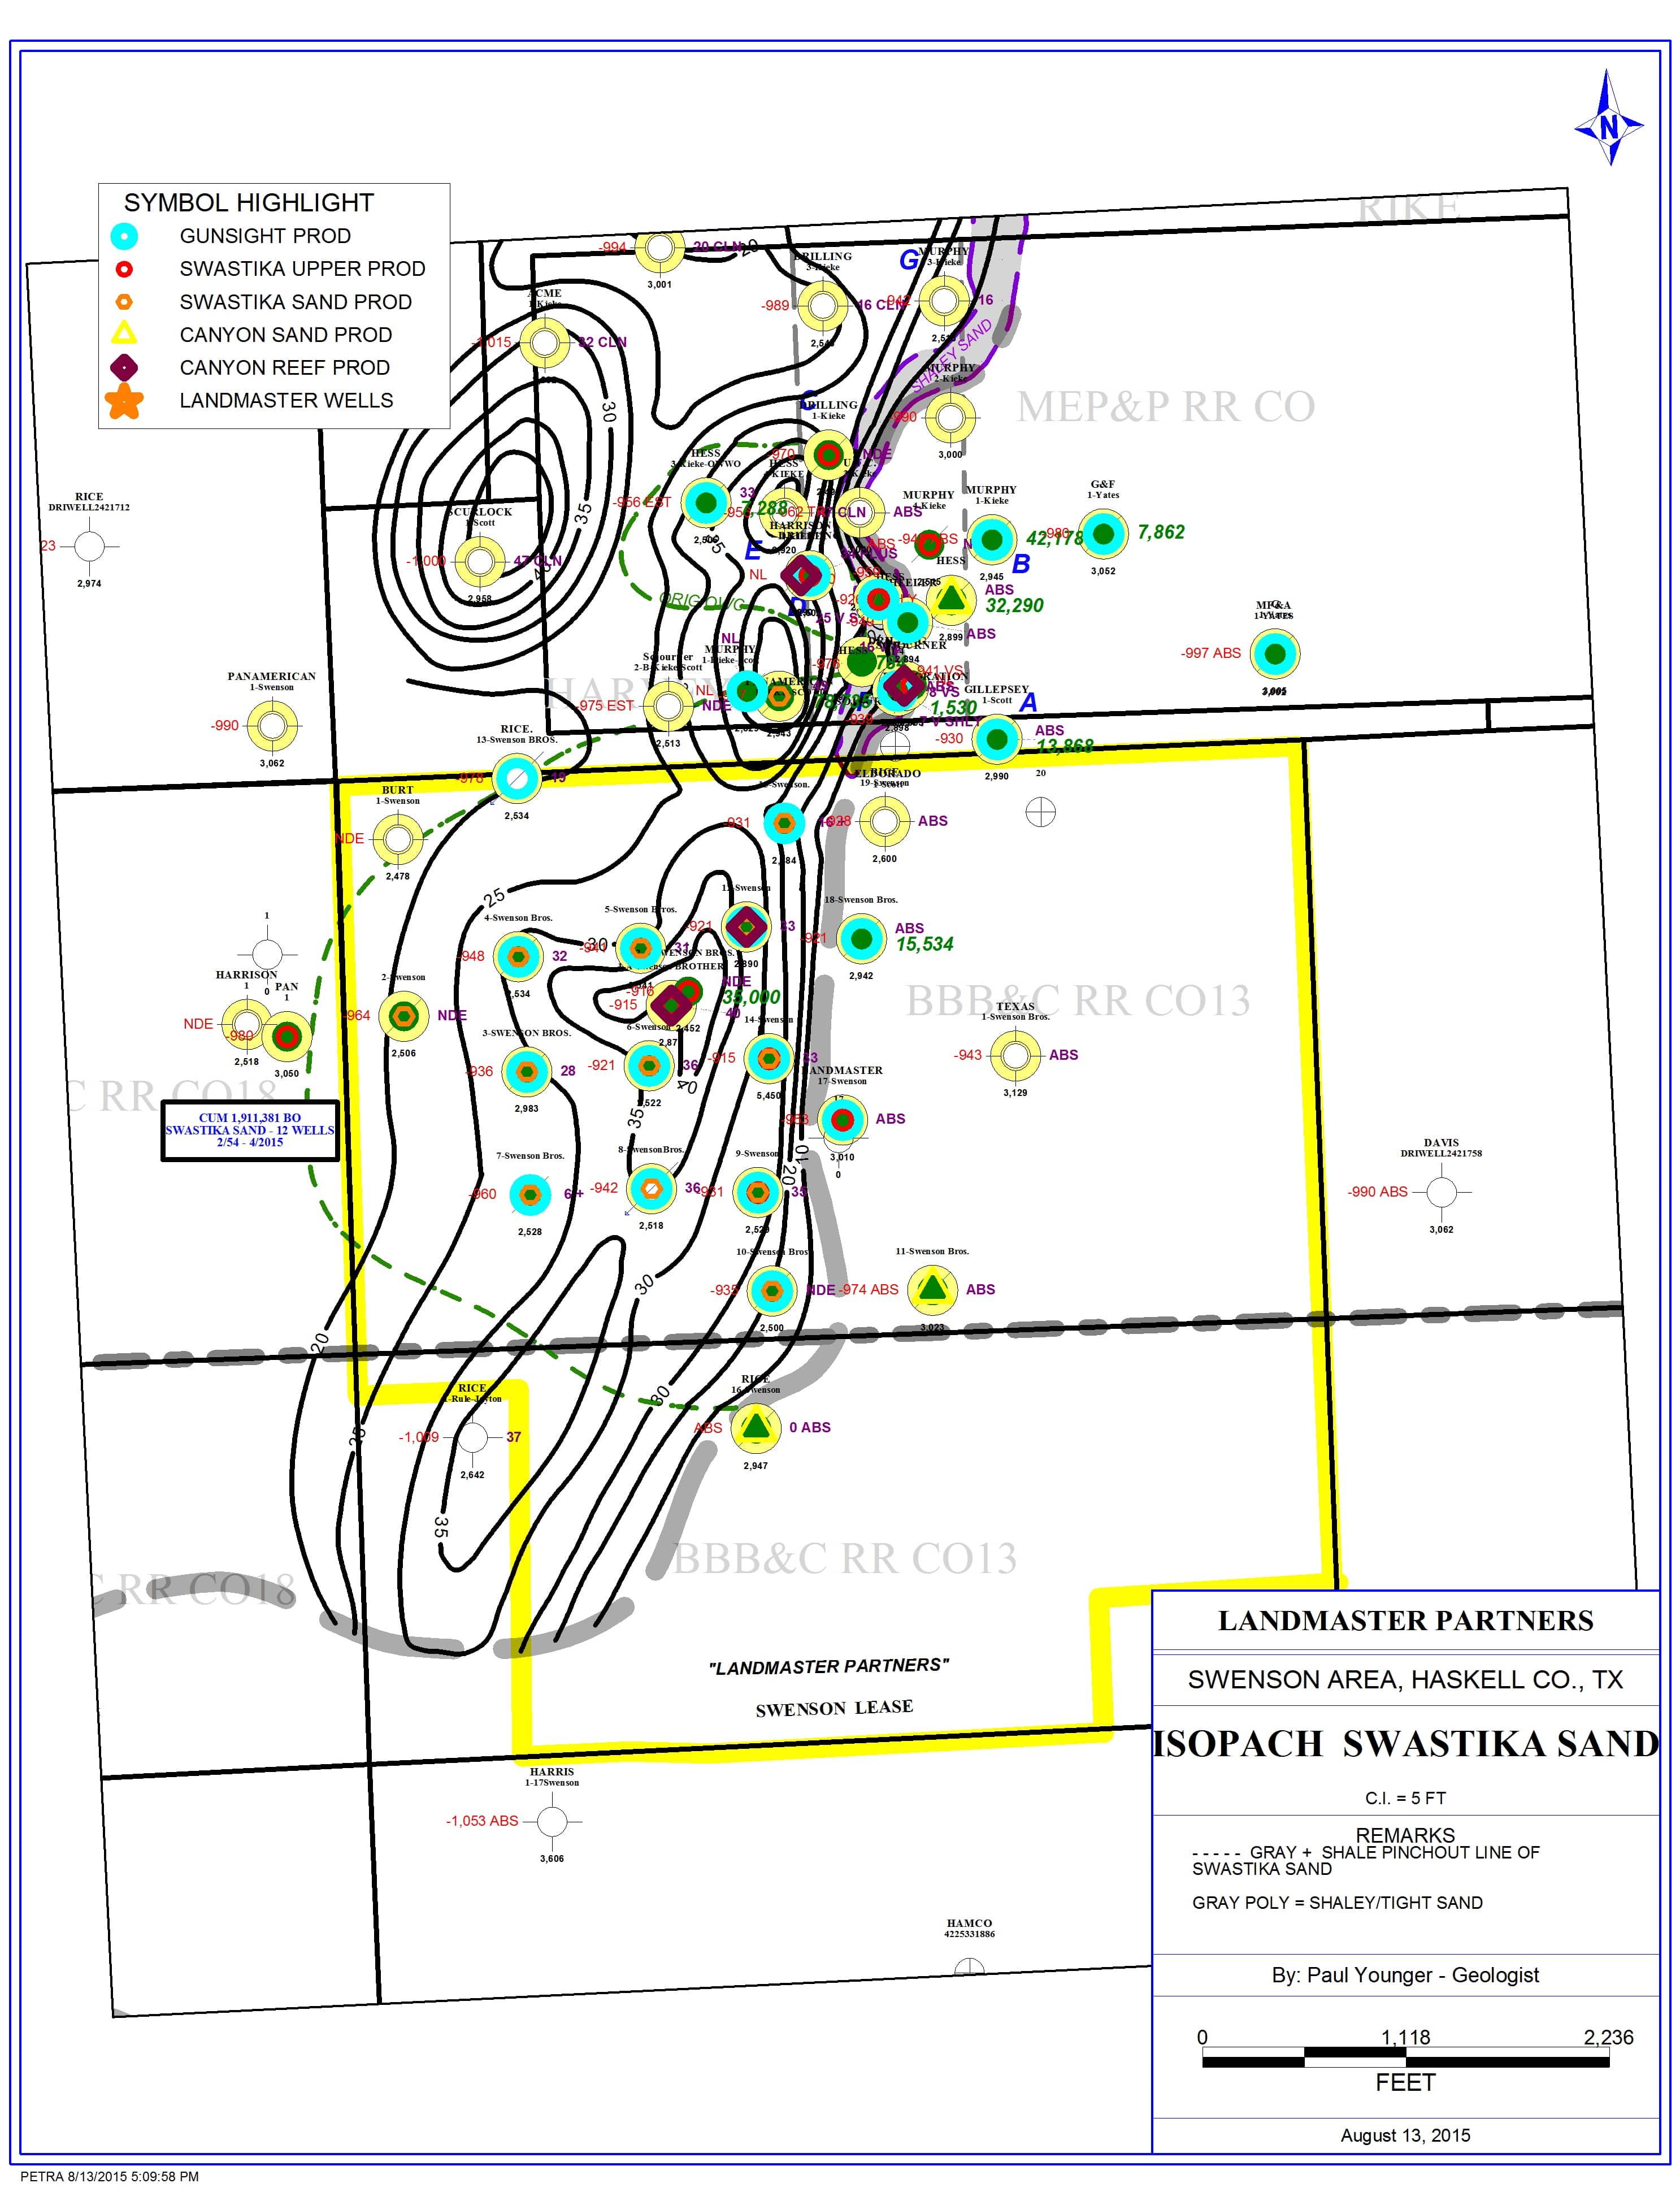 Texas Properties – South Plains Petroleum, Inc